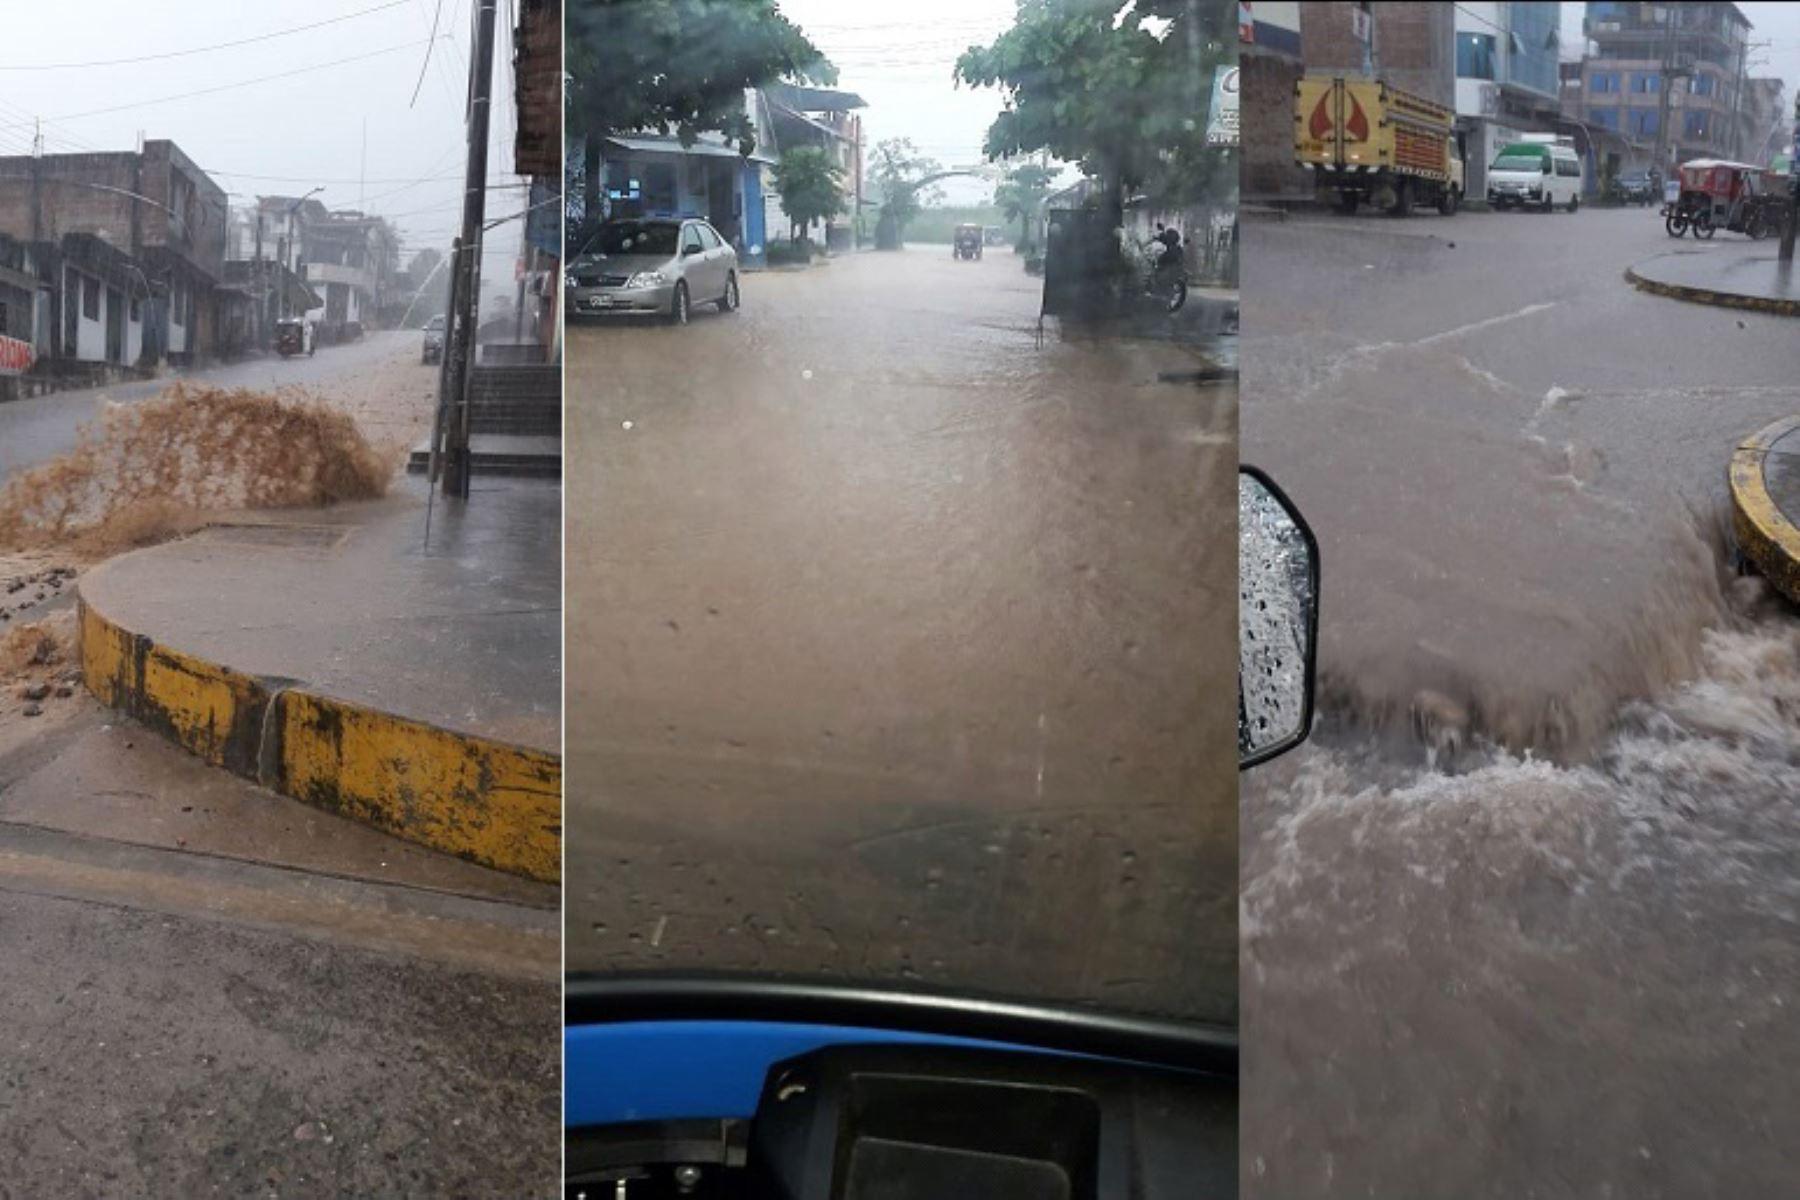 Lluvia intensa se registra ahora en distrito de Pichanaki, en Junín. Foto: C. Madueño/Senamhi/Twitter